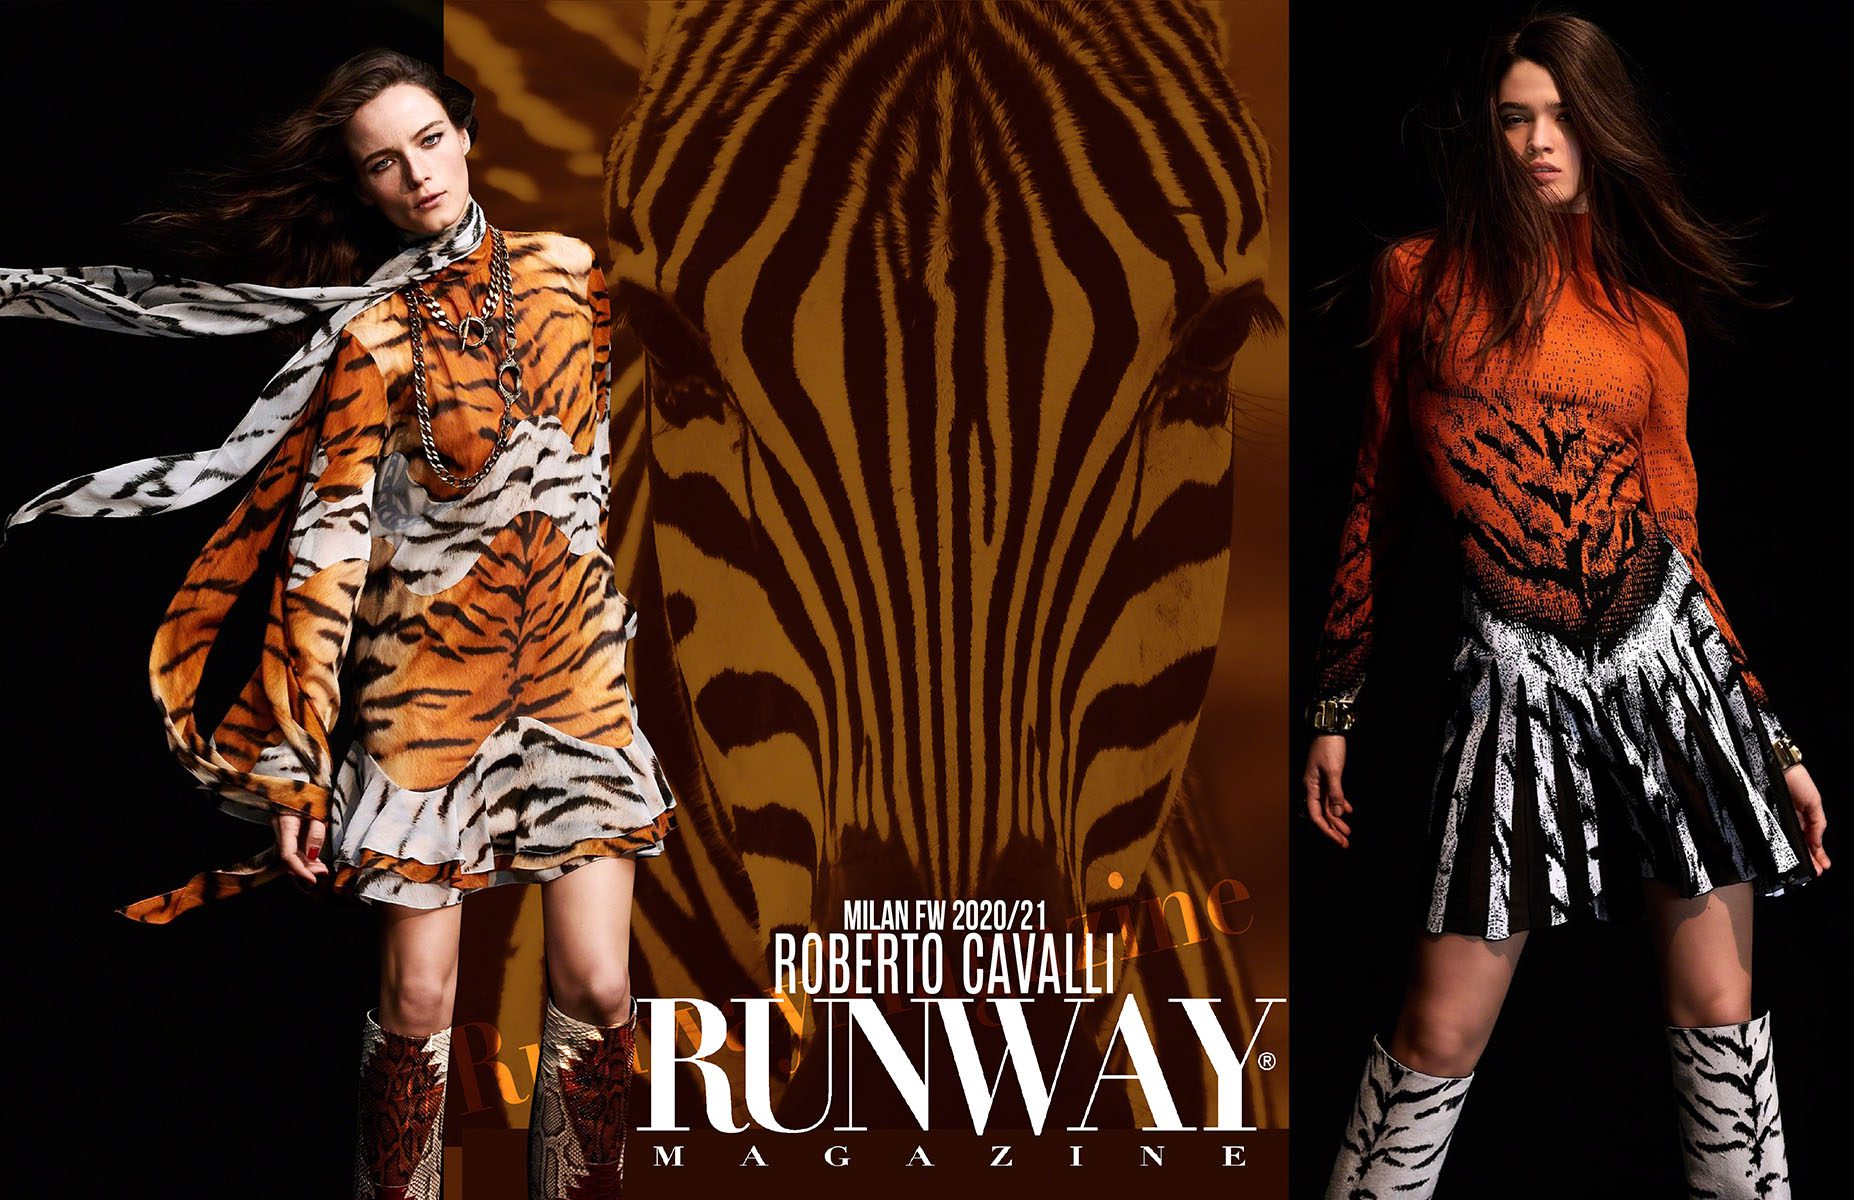 ROBERTO CAVALLI Fall-Winter 2020-2021 Milan by RUNWAY MAGAZINE